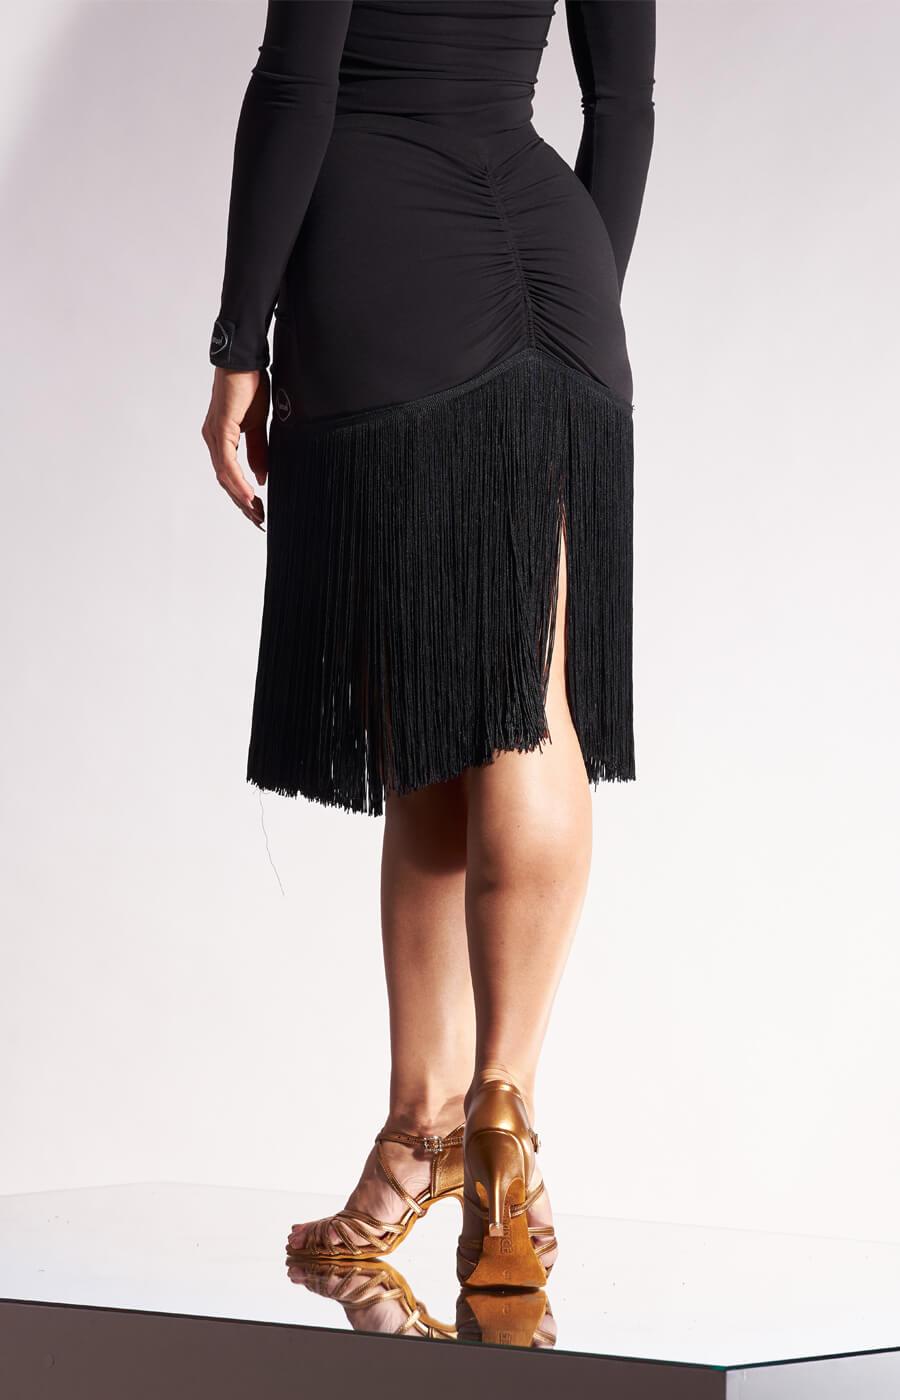 Ursula latin skirt